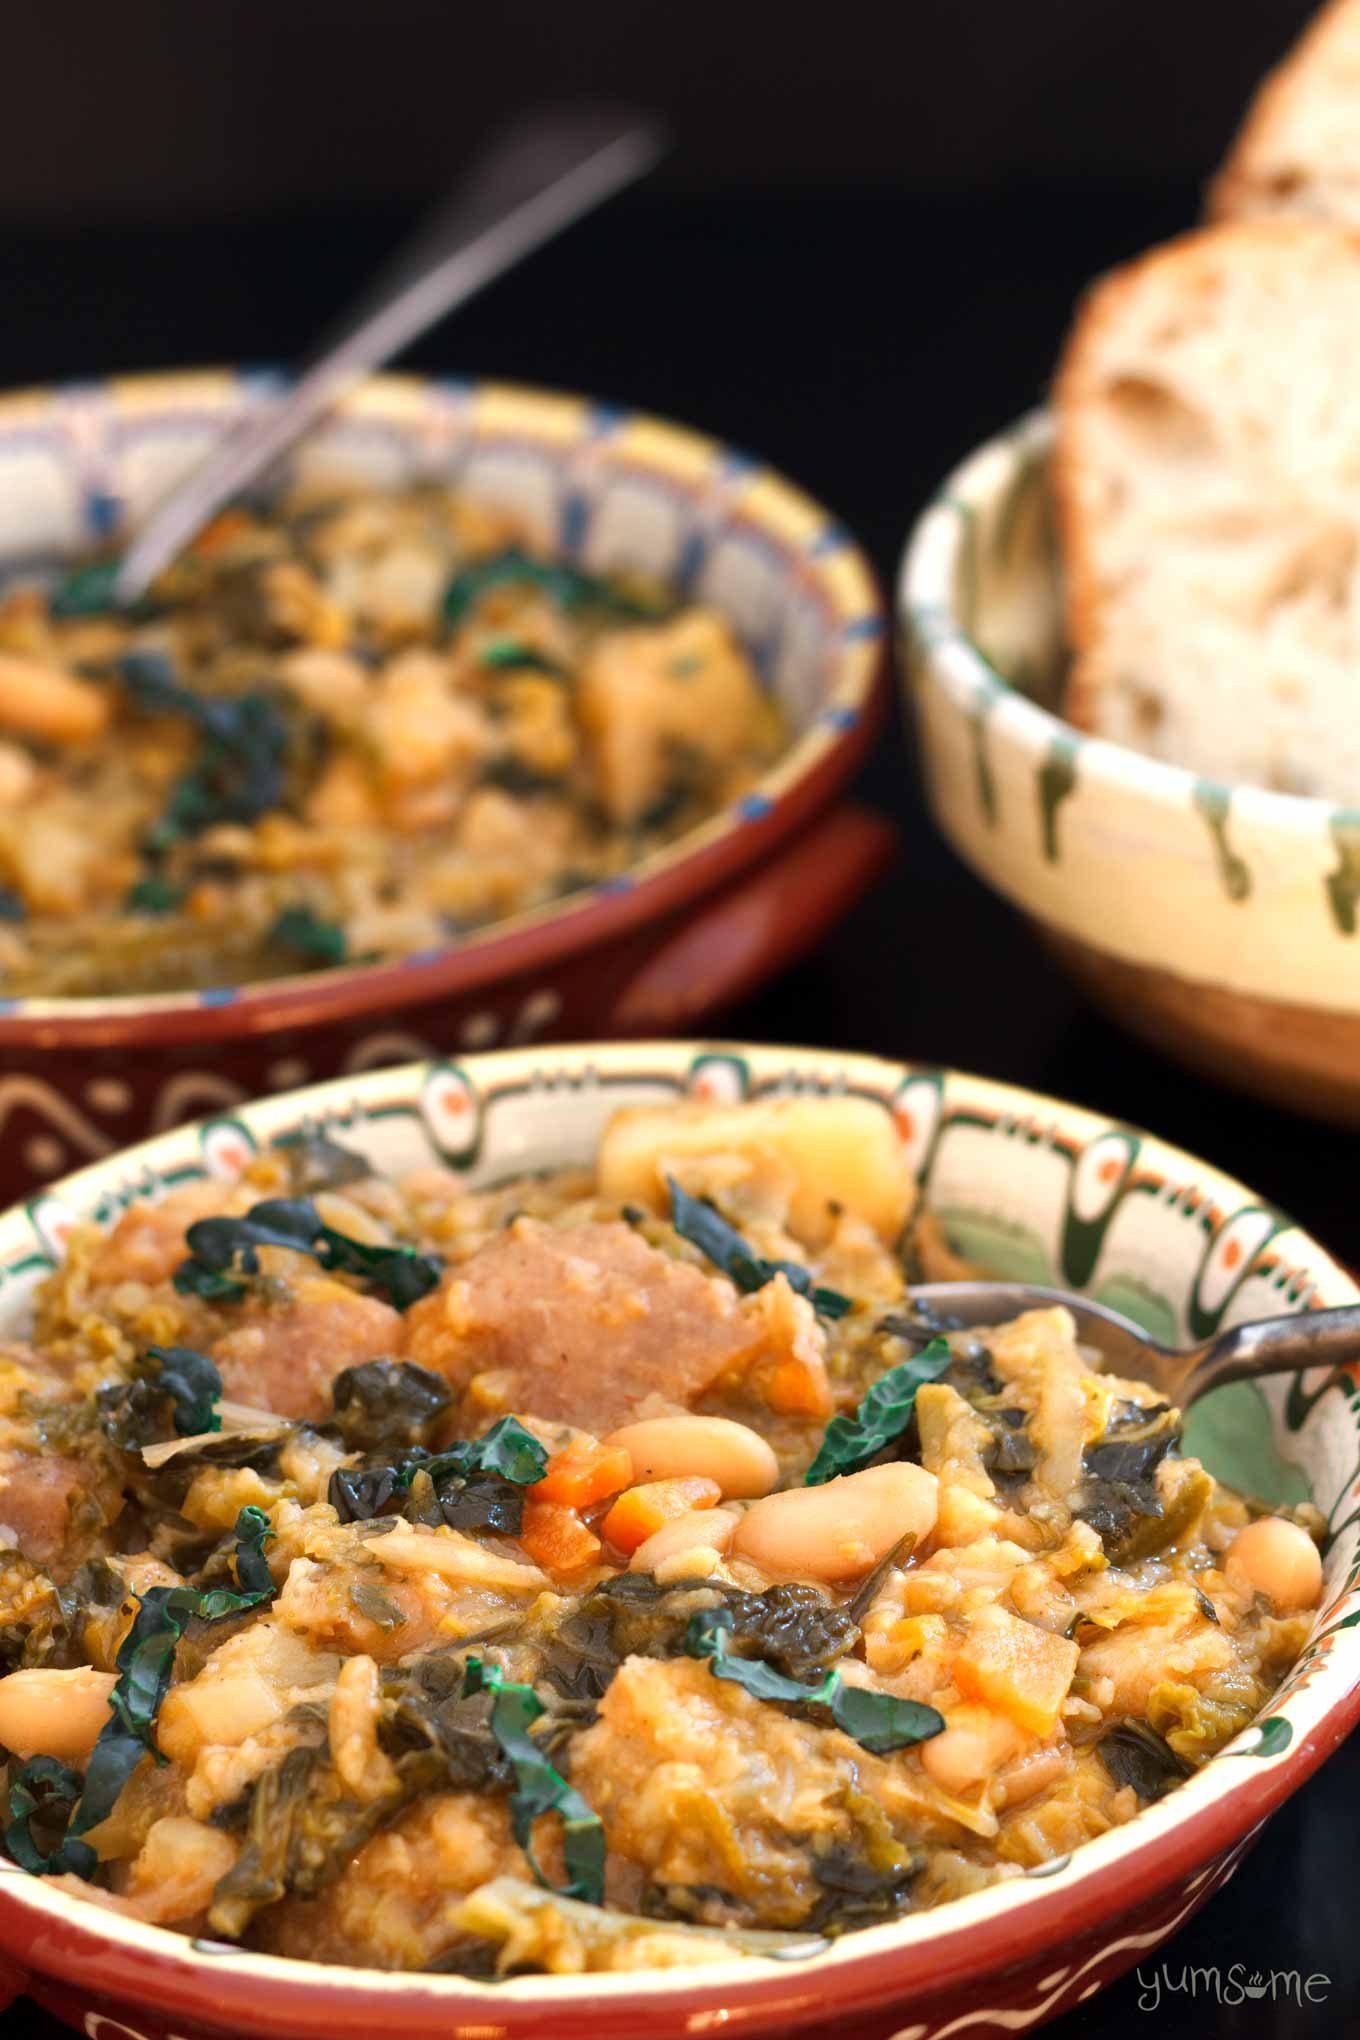 ribollita - Tuscan bread soup | yumsome.com